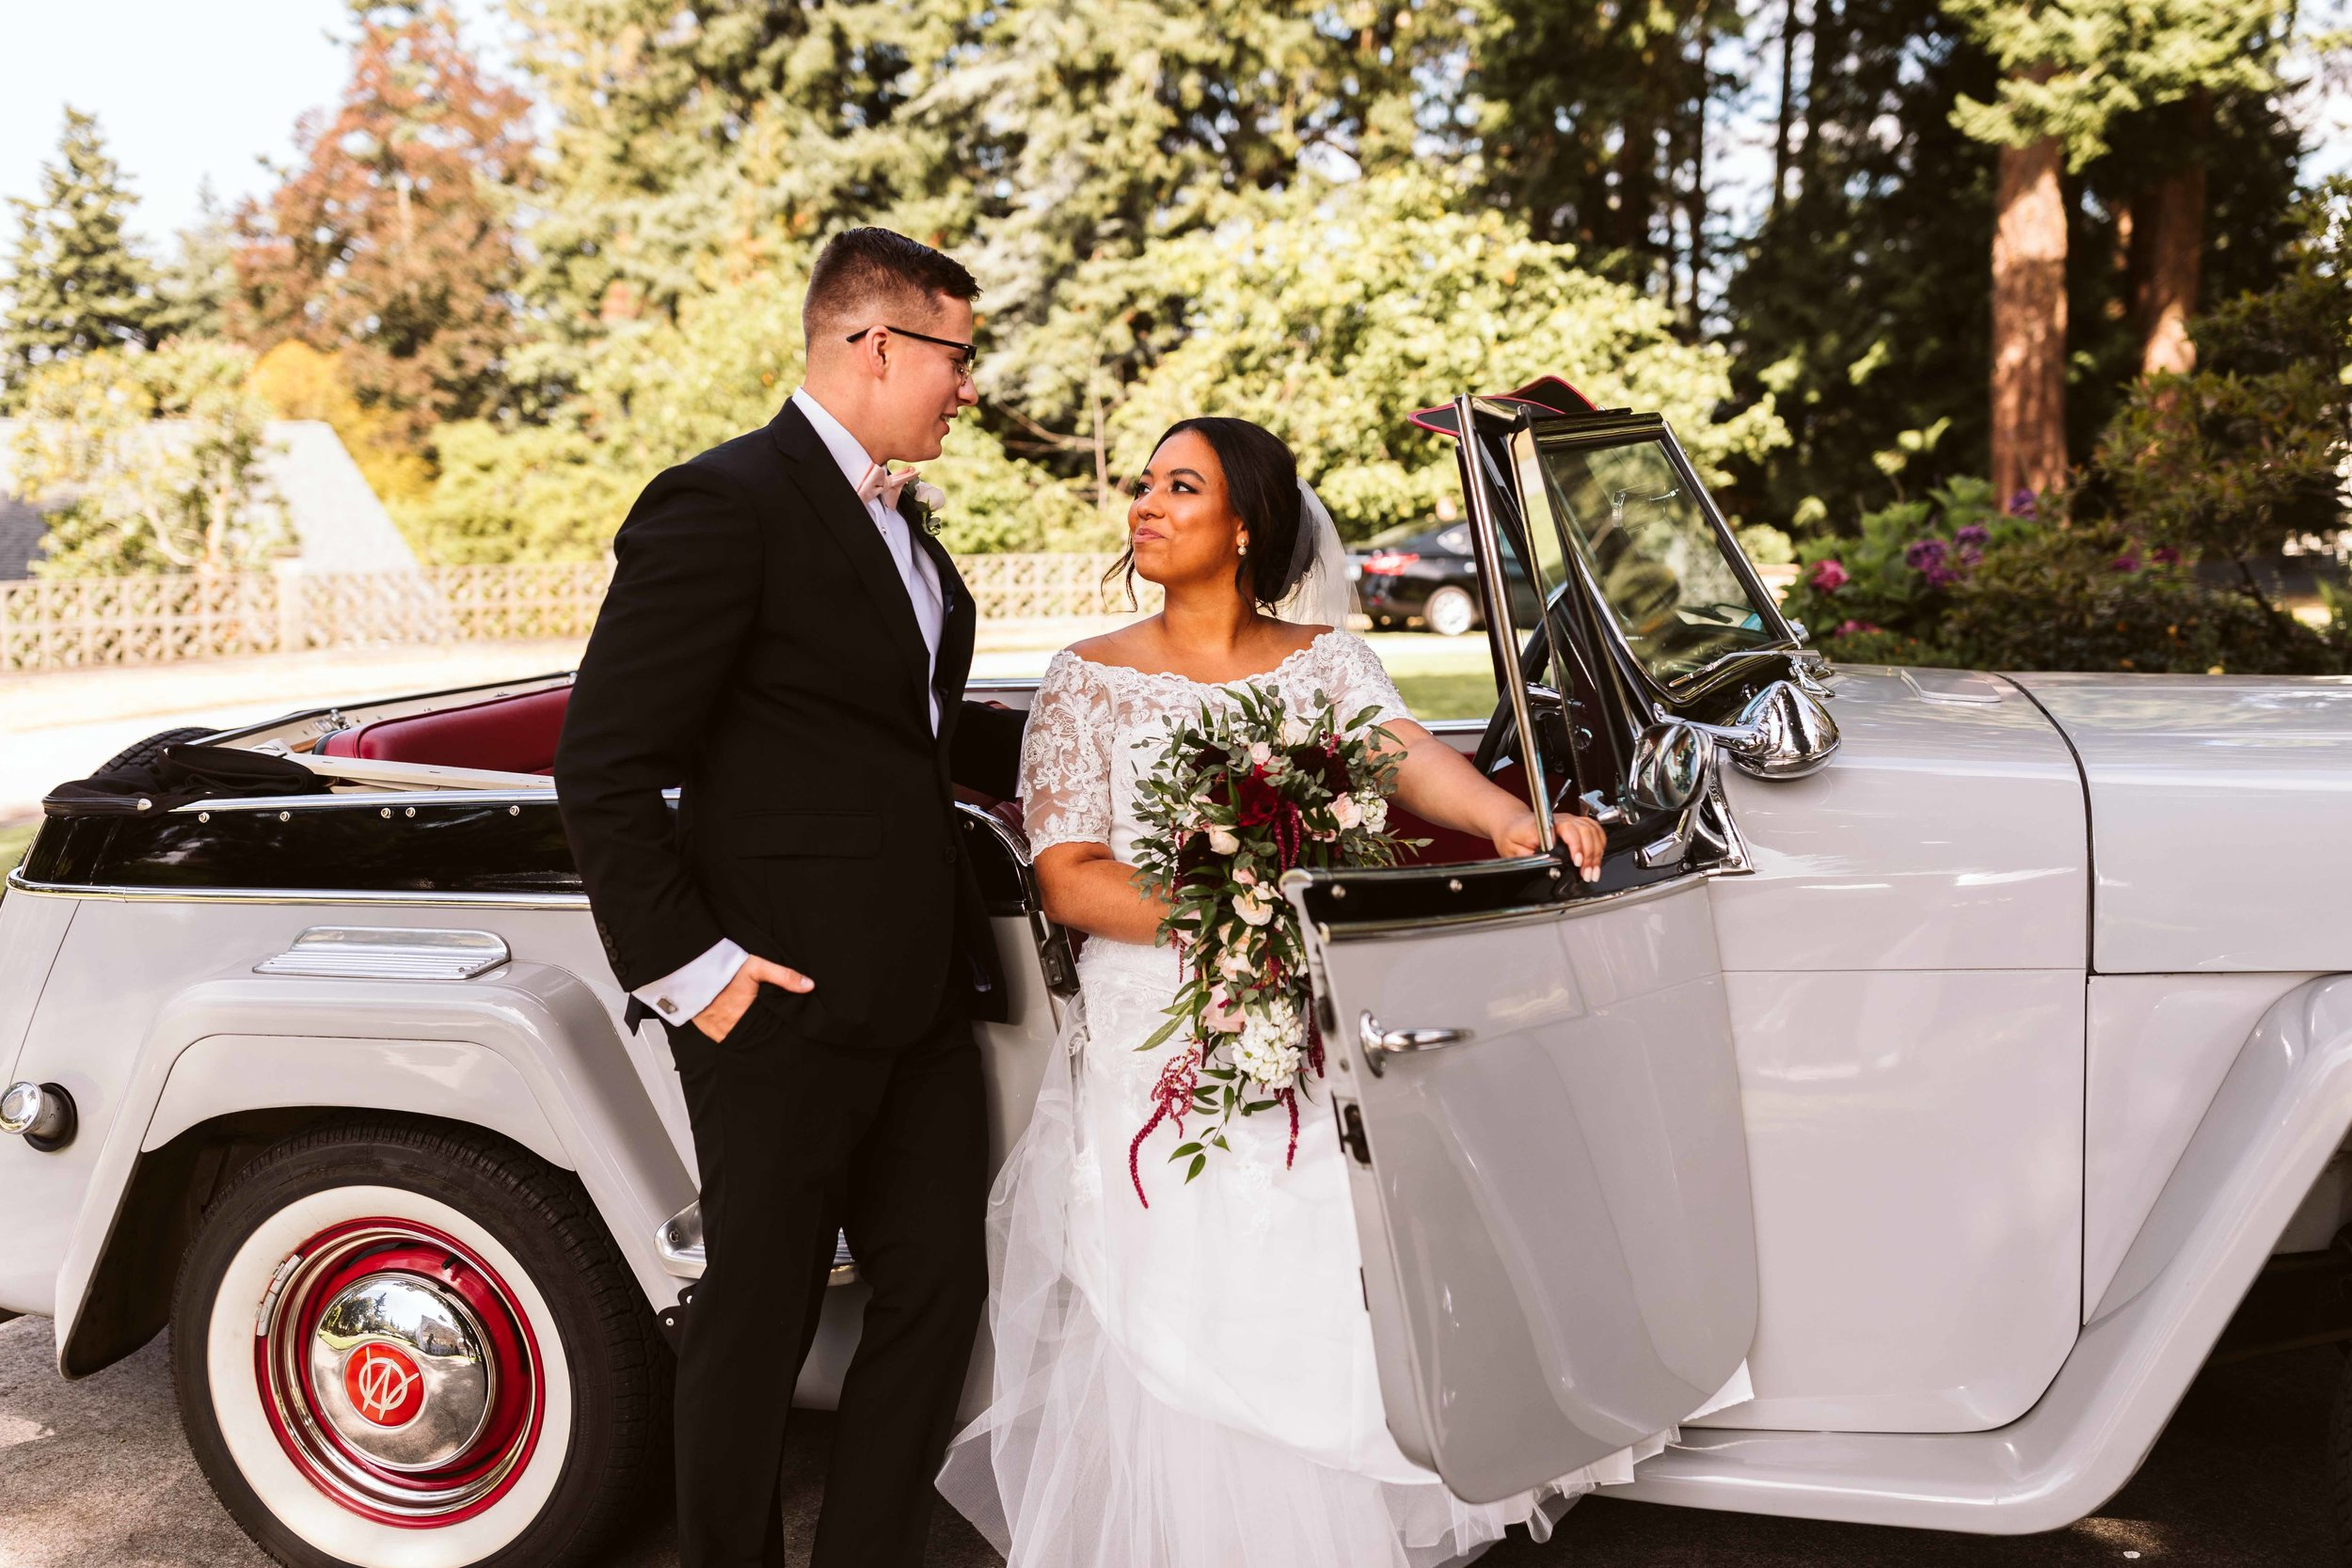 lairmont-manor-wedding-47.jpg